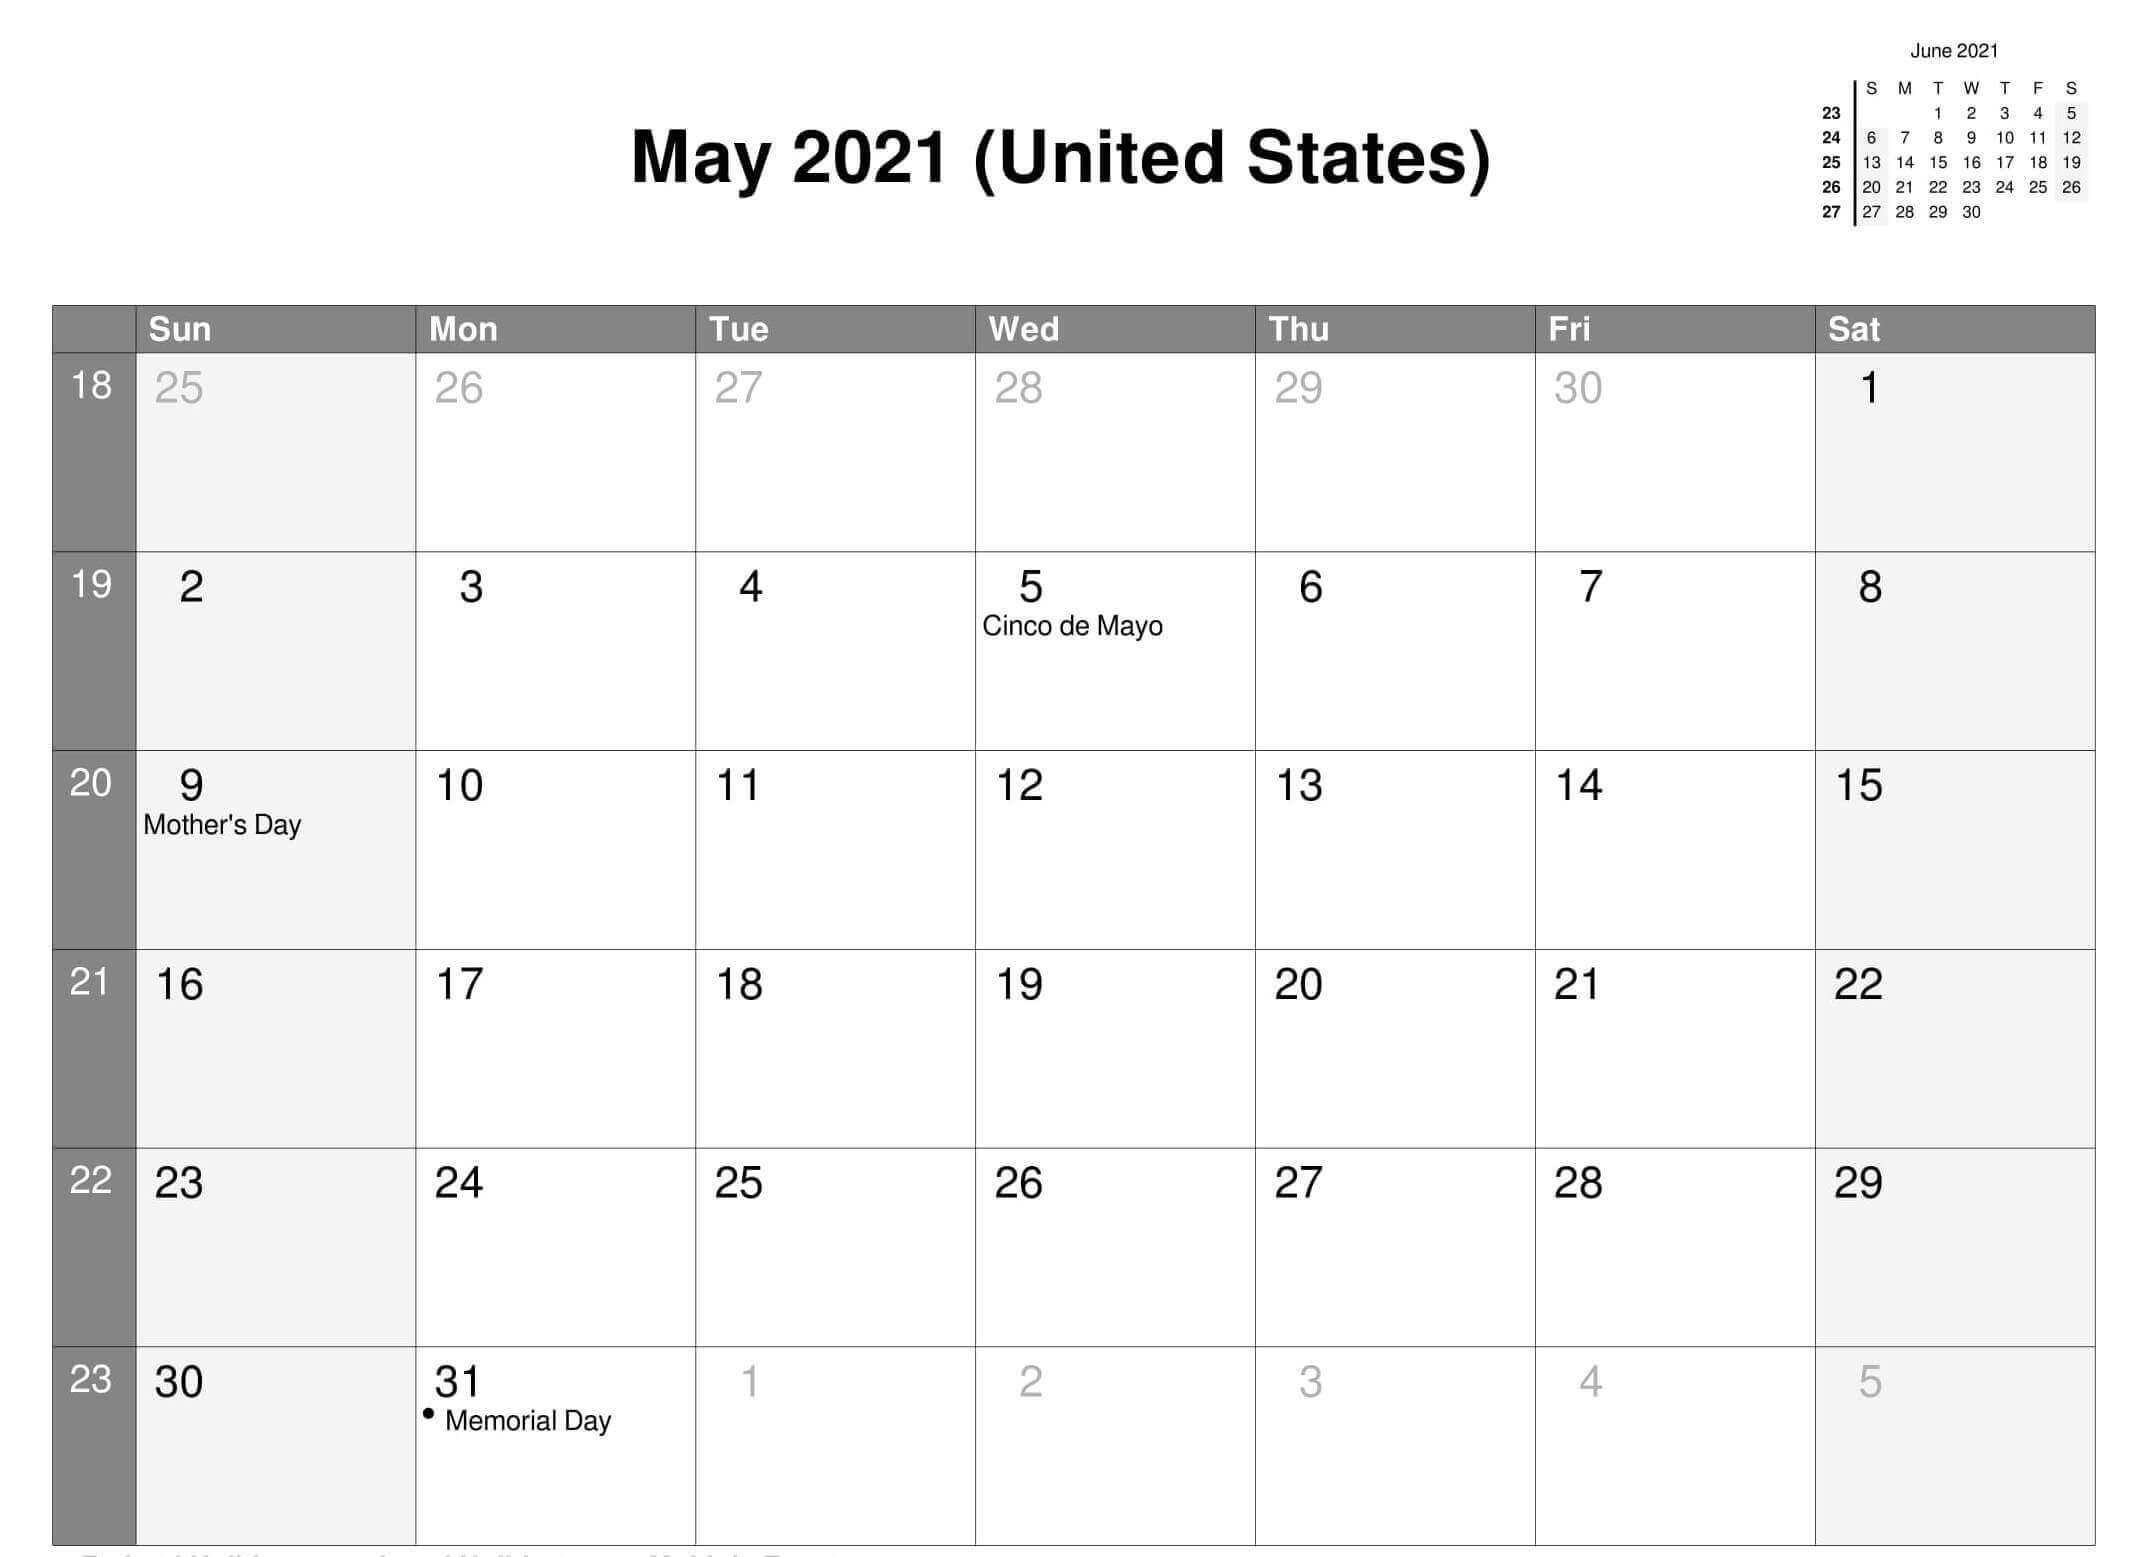 May 2021 USA Holidays Calendar